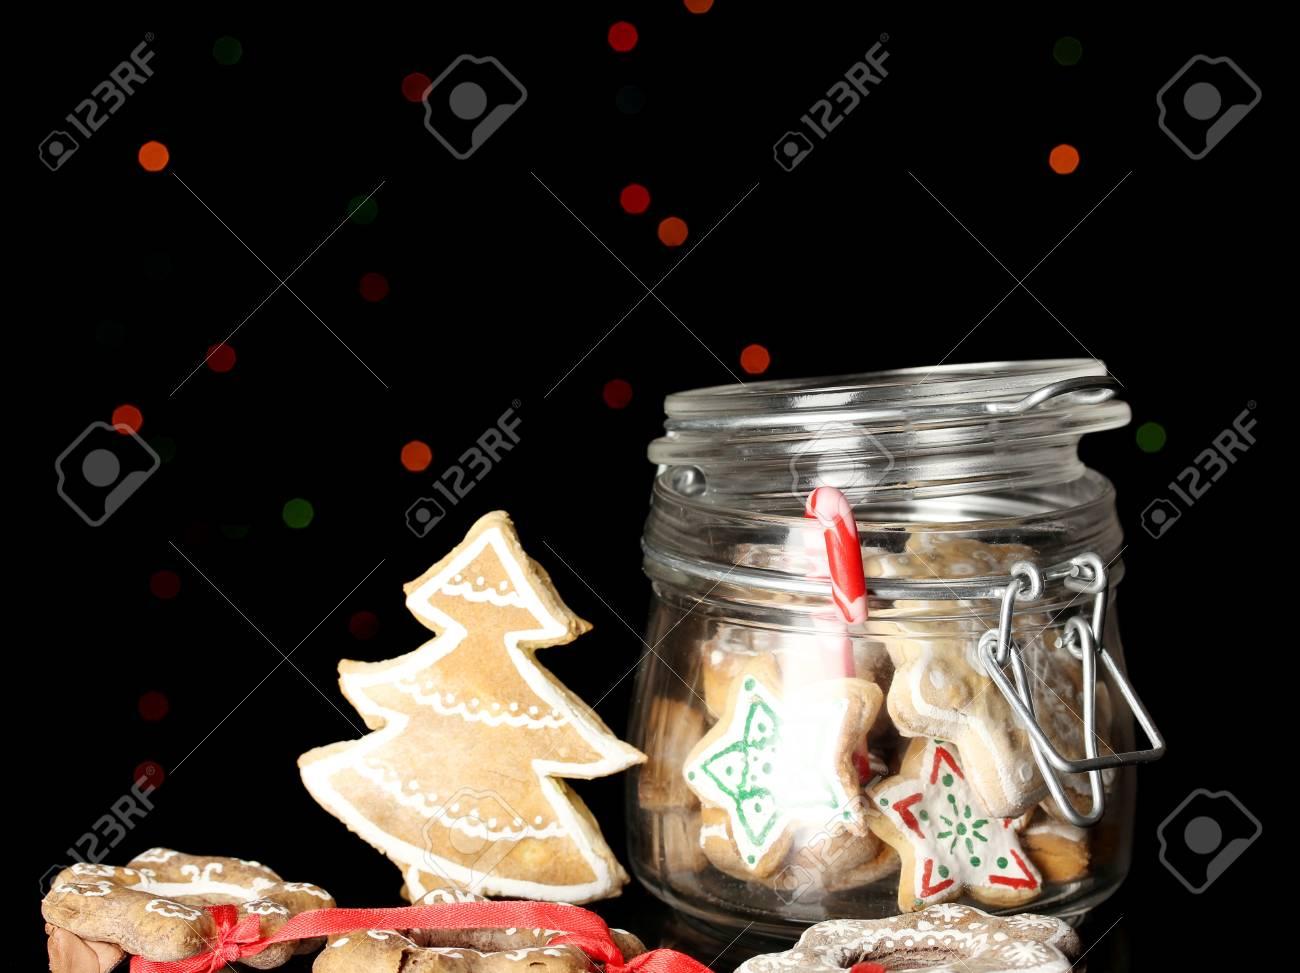 Christmas treats in bank on Christmas lights background Stock Photo - 17140219